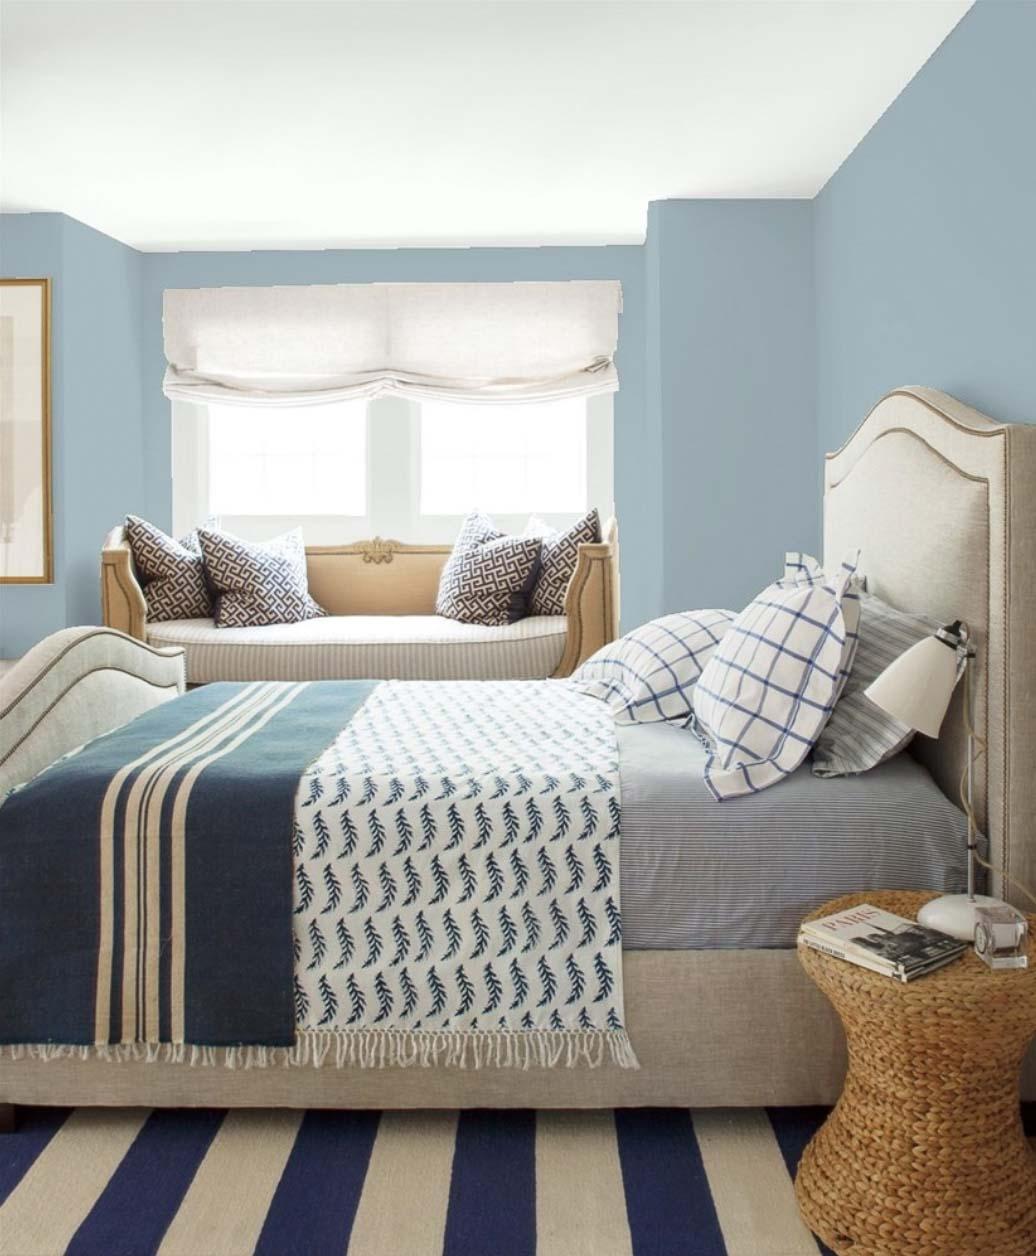 Bedroom paint color idea benjamin moore nantucket fog